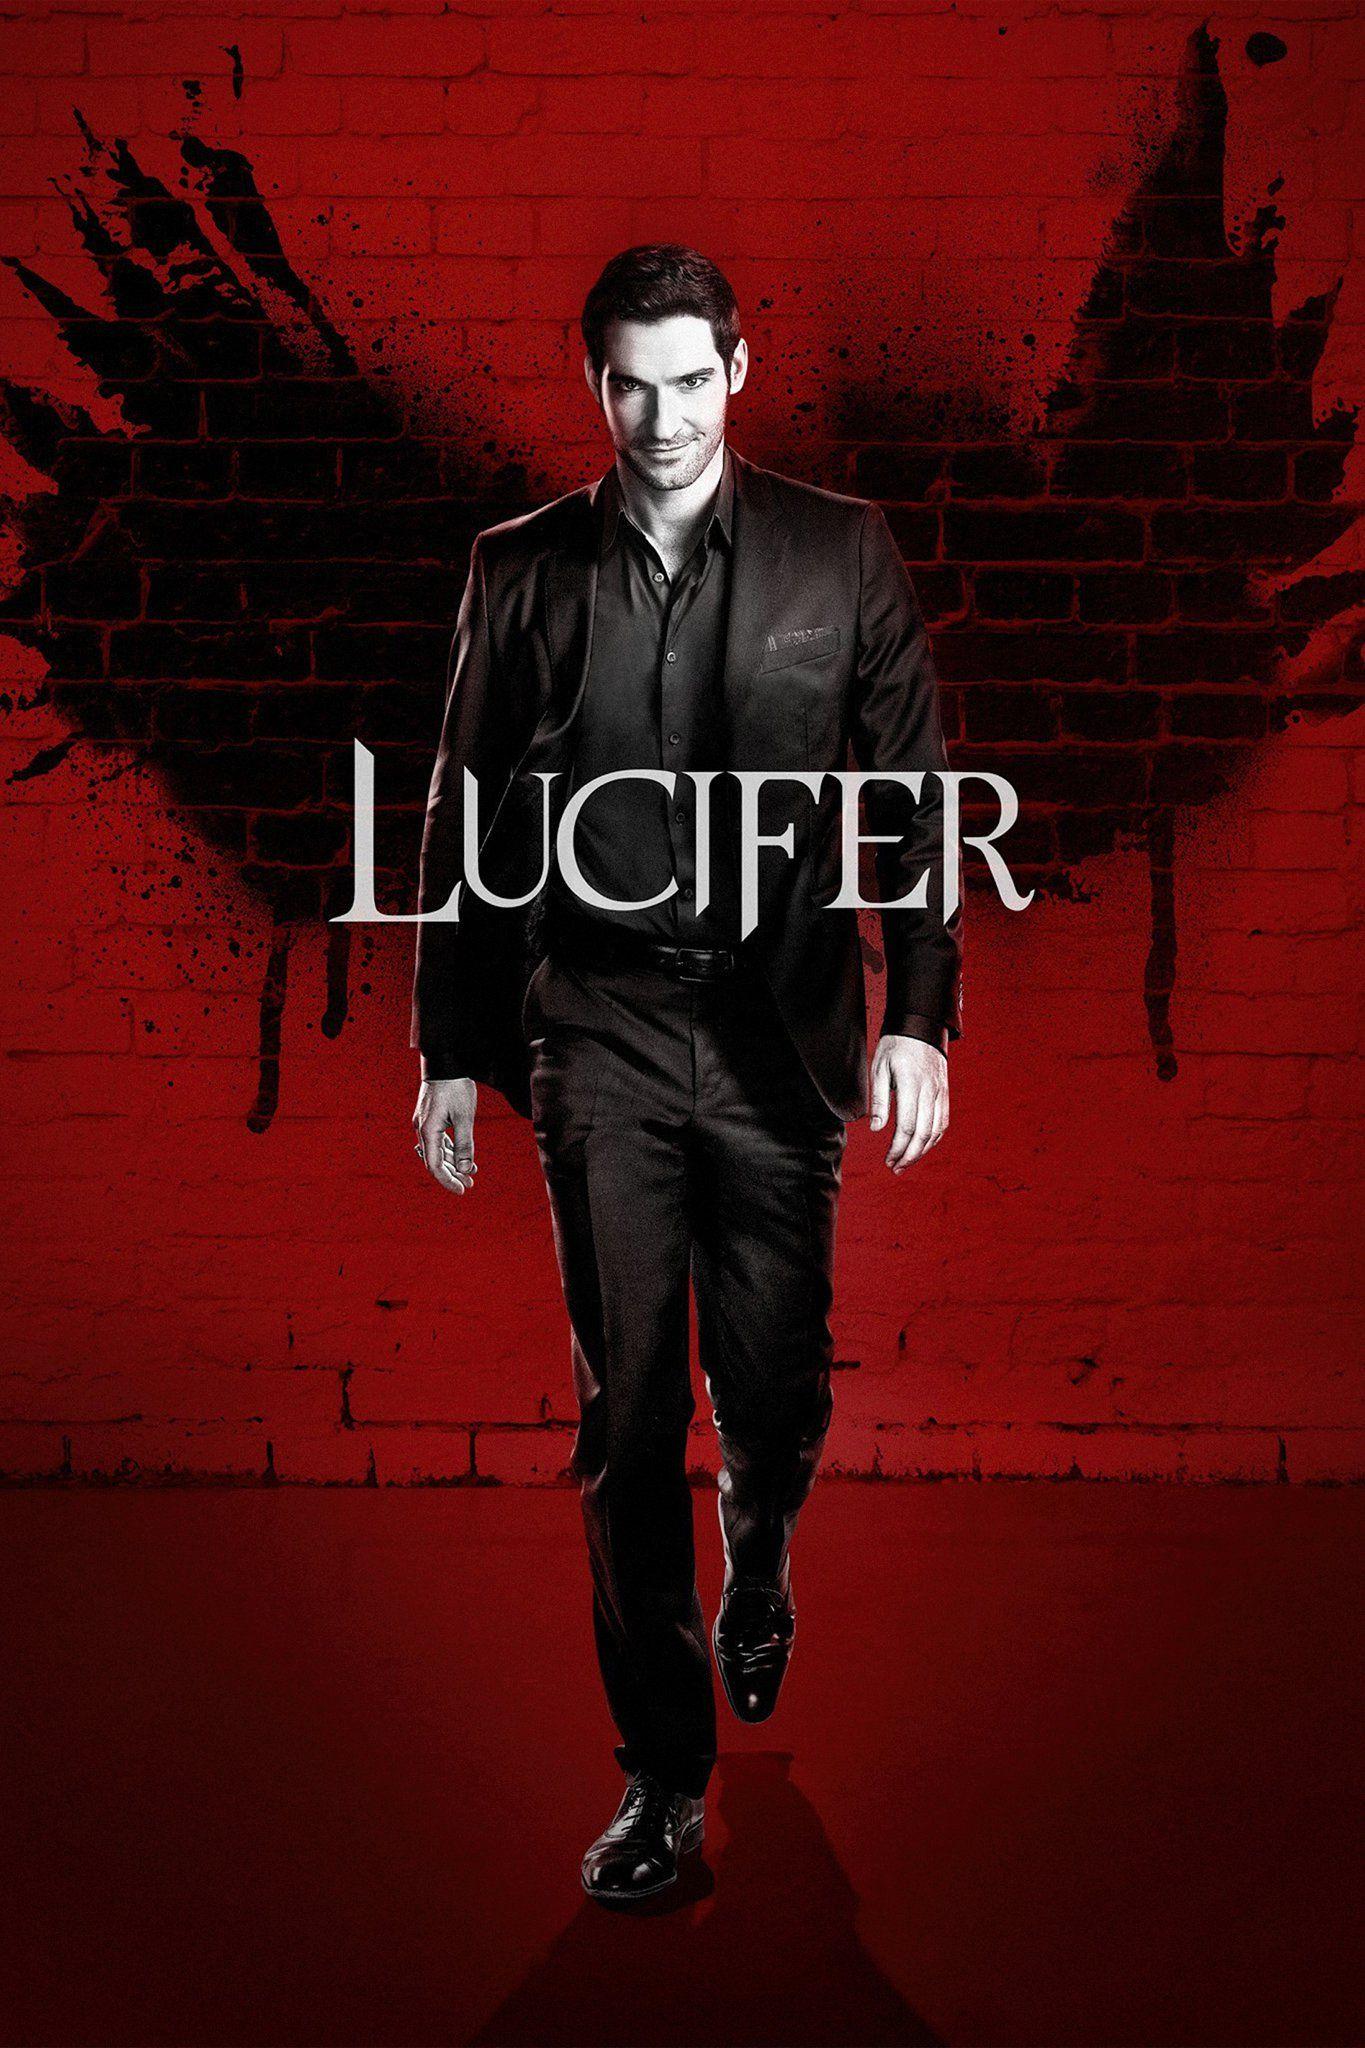 Lucifer S2 Promotional Poster Series Y Peliculas Mejores Series